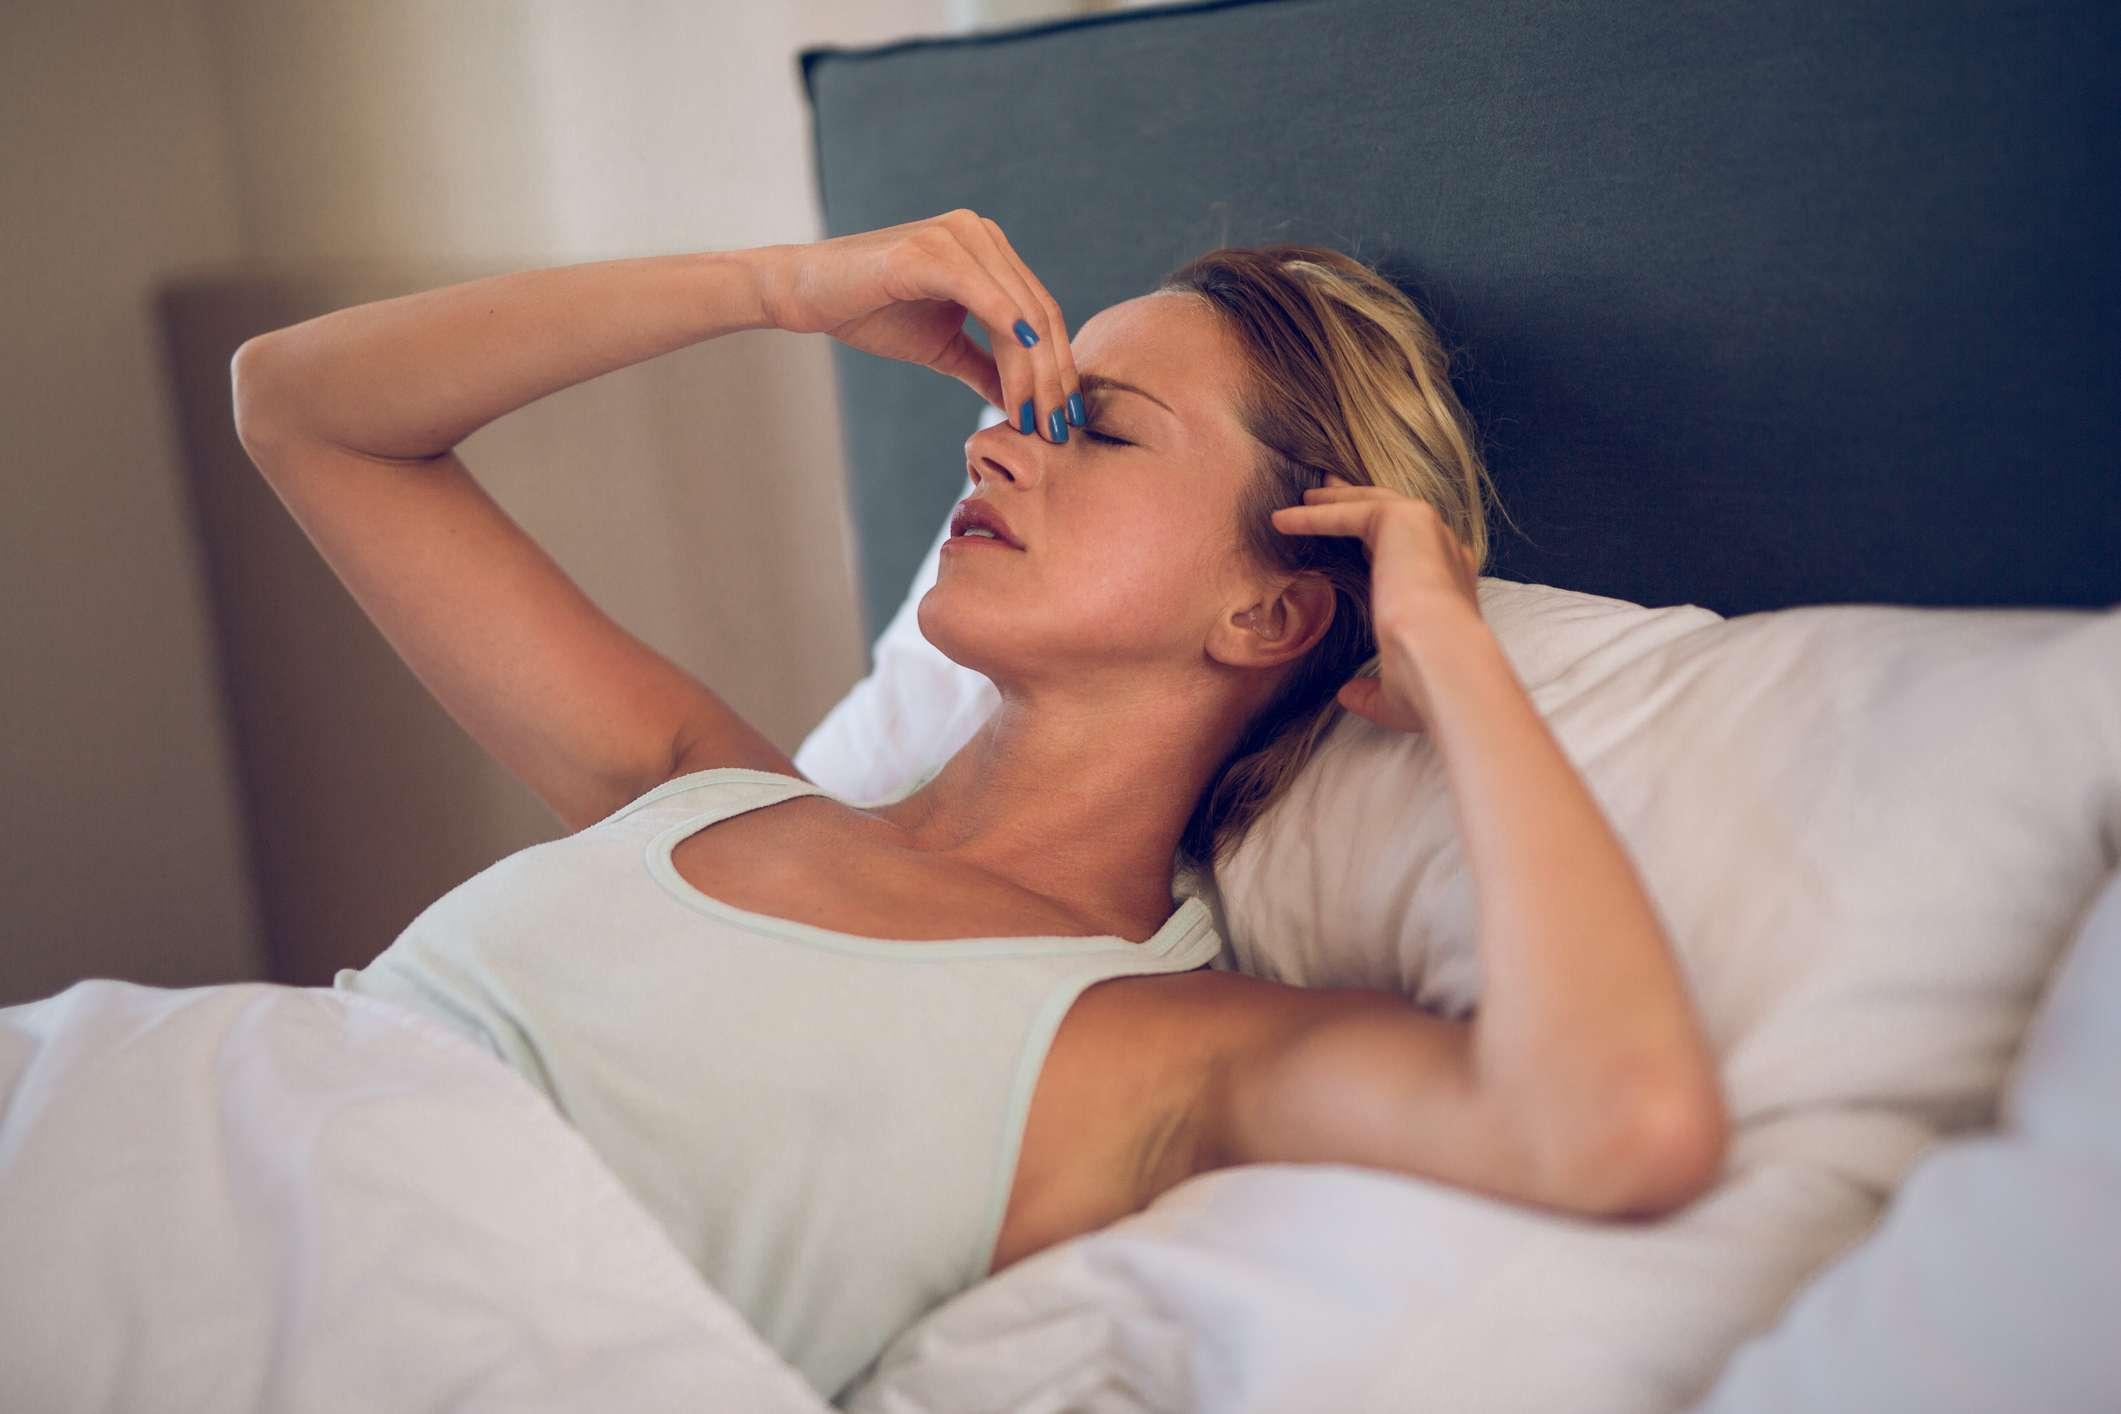 Young woman having severe headache